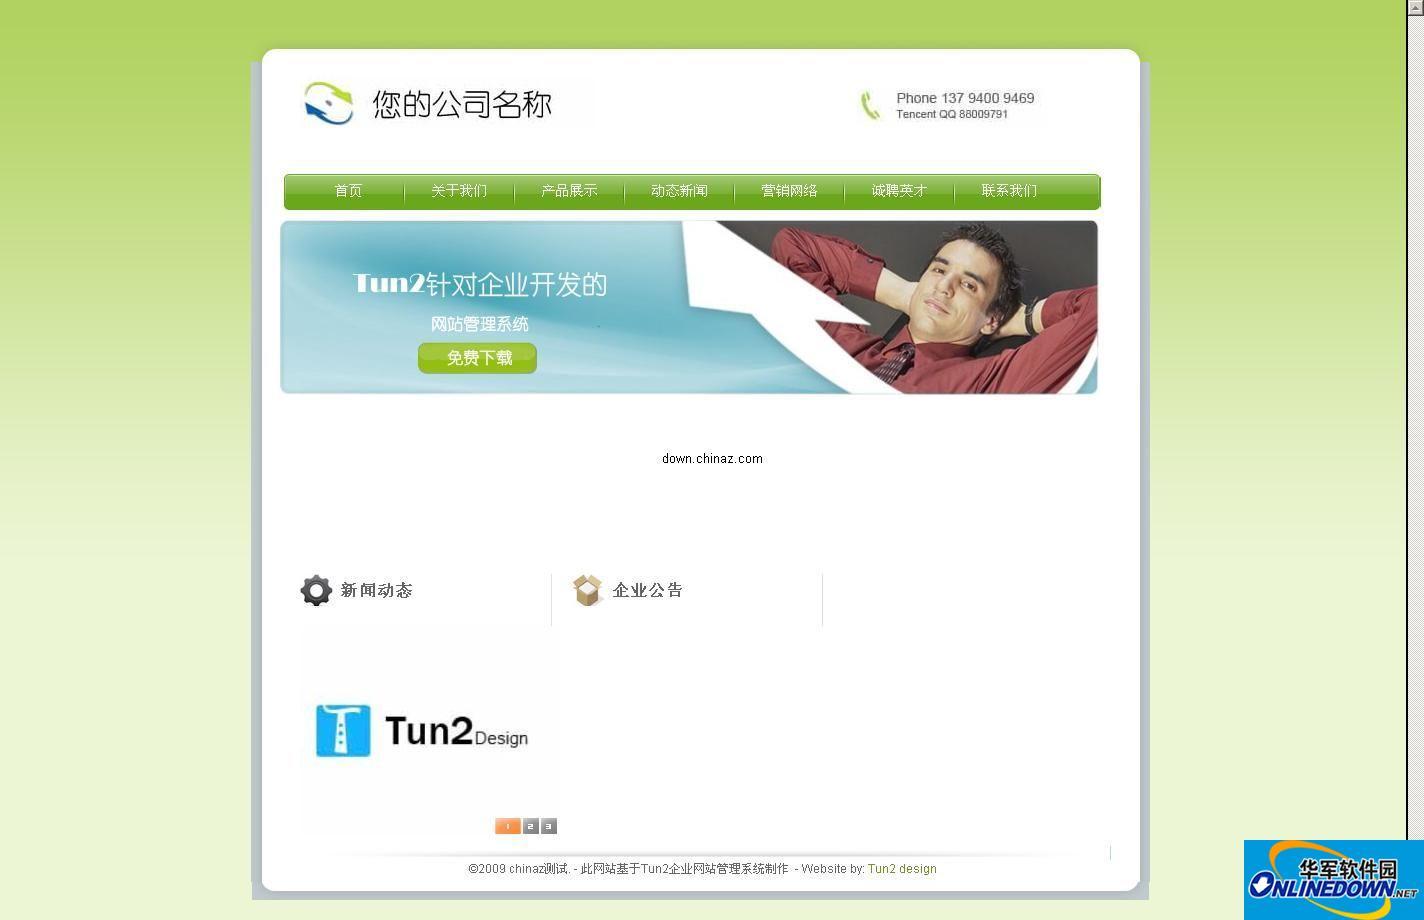 Tun2 php 企业网站管理系统(可生成静态html)